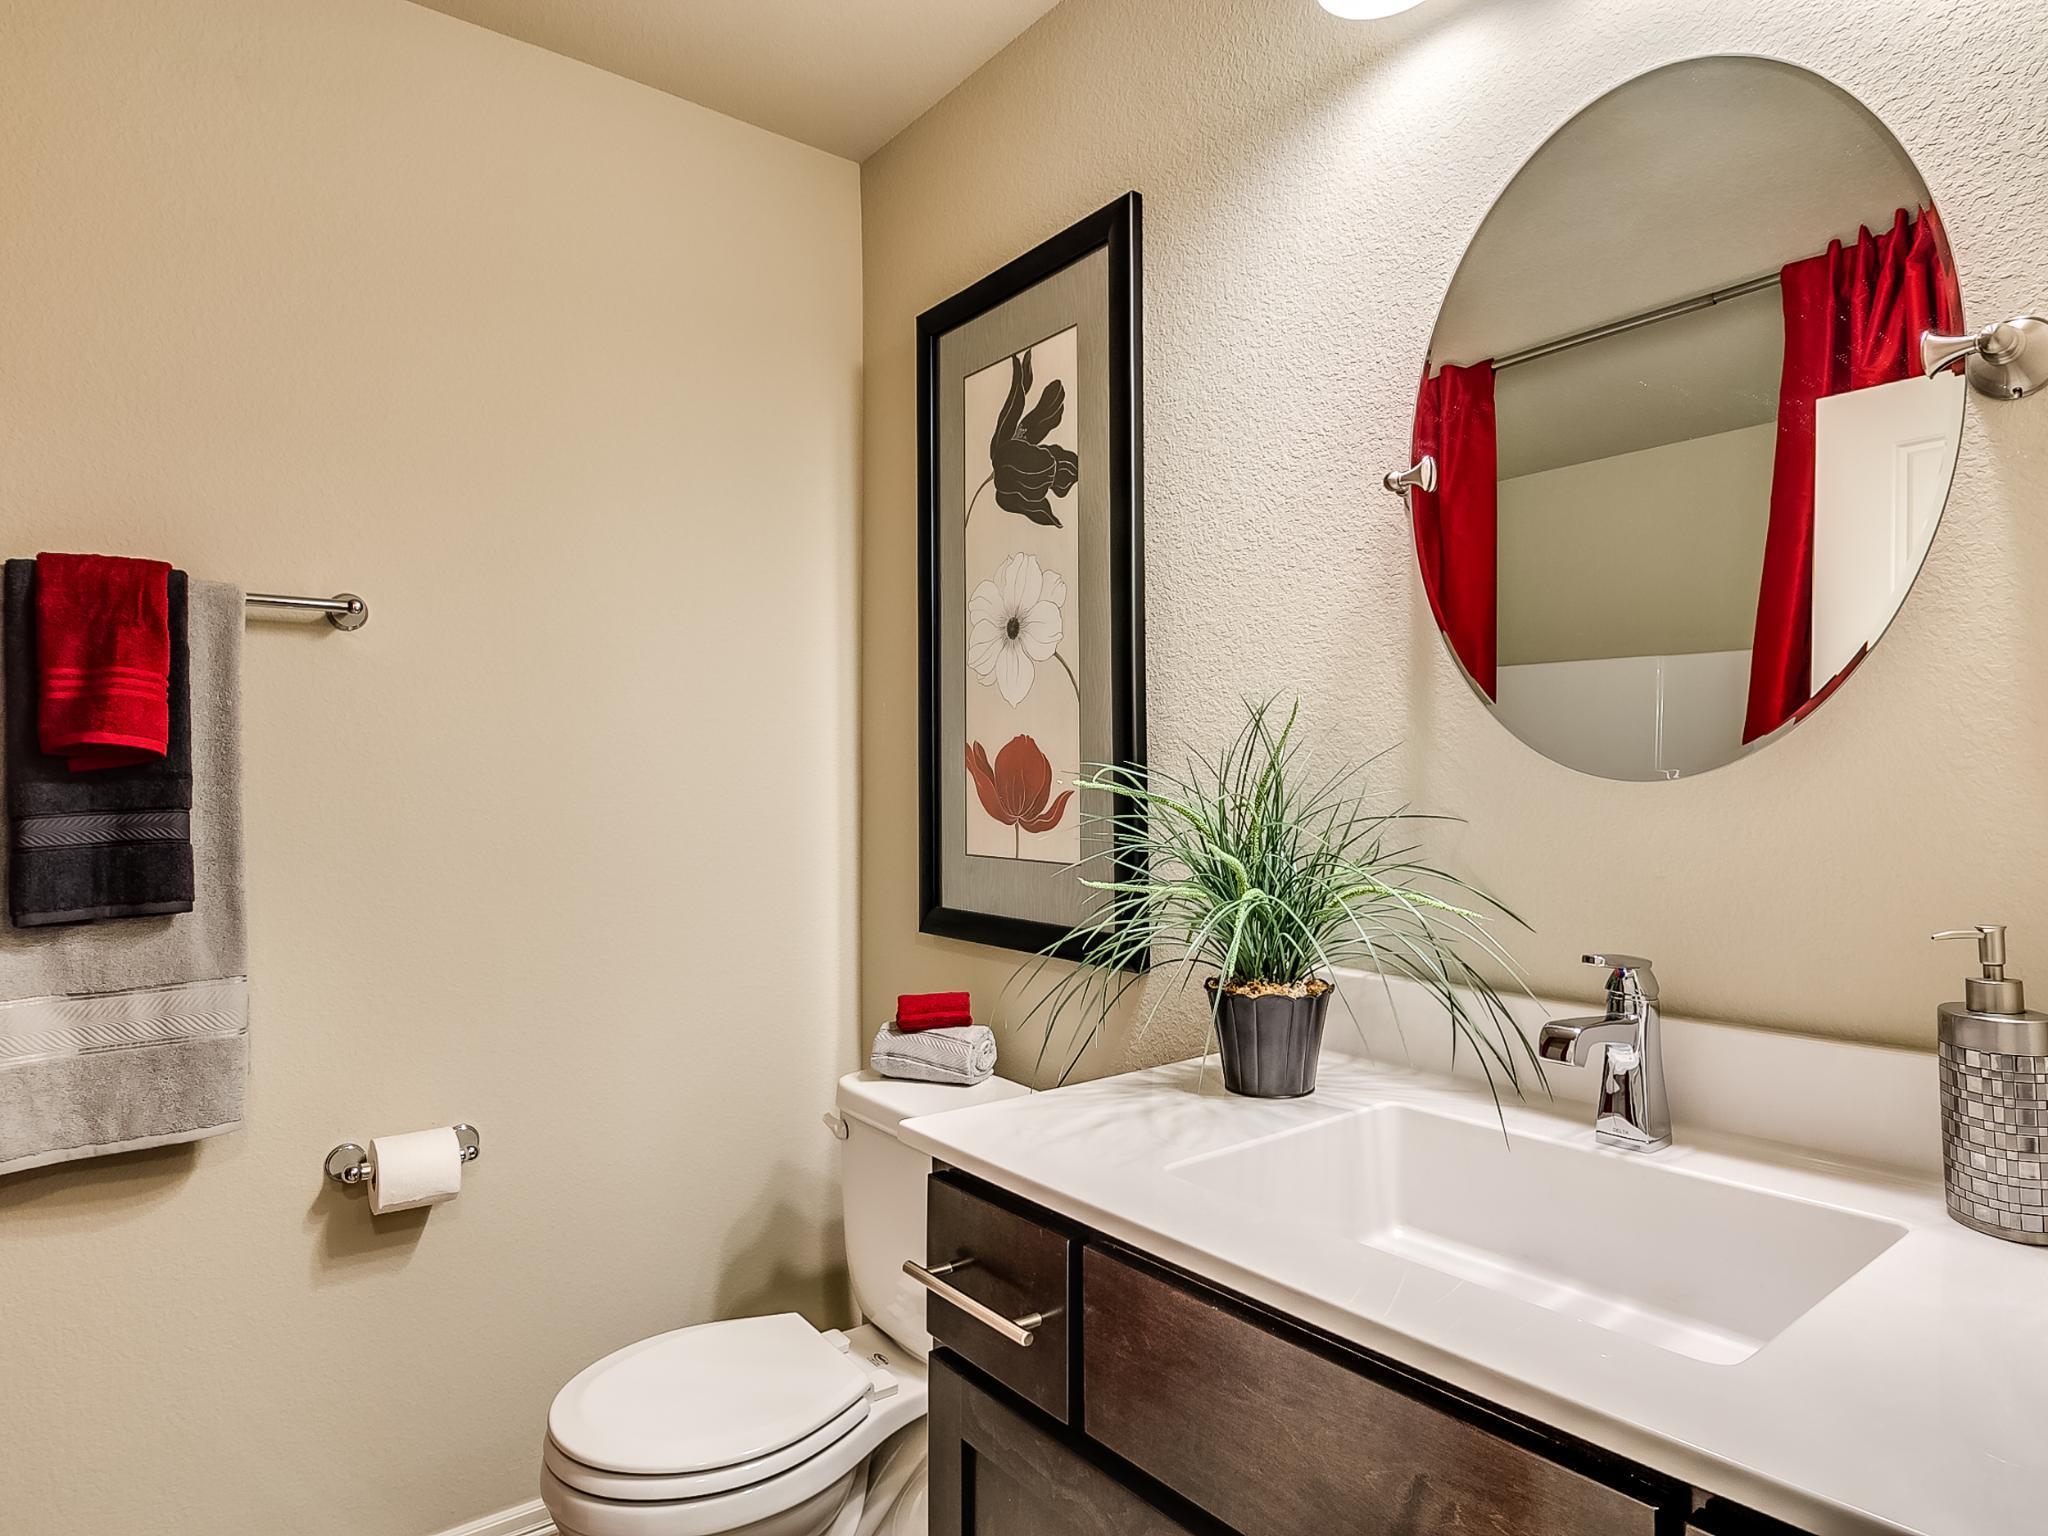 Bathroom-in-Raleigh-at-Breitling Village-in-Jenks